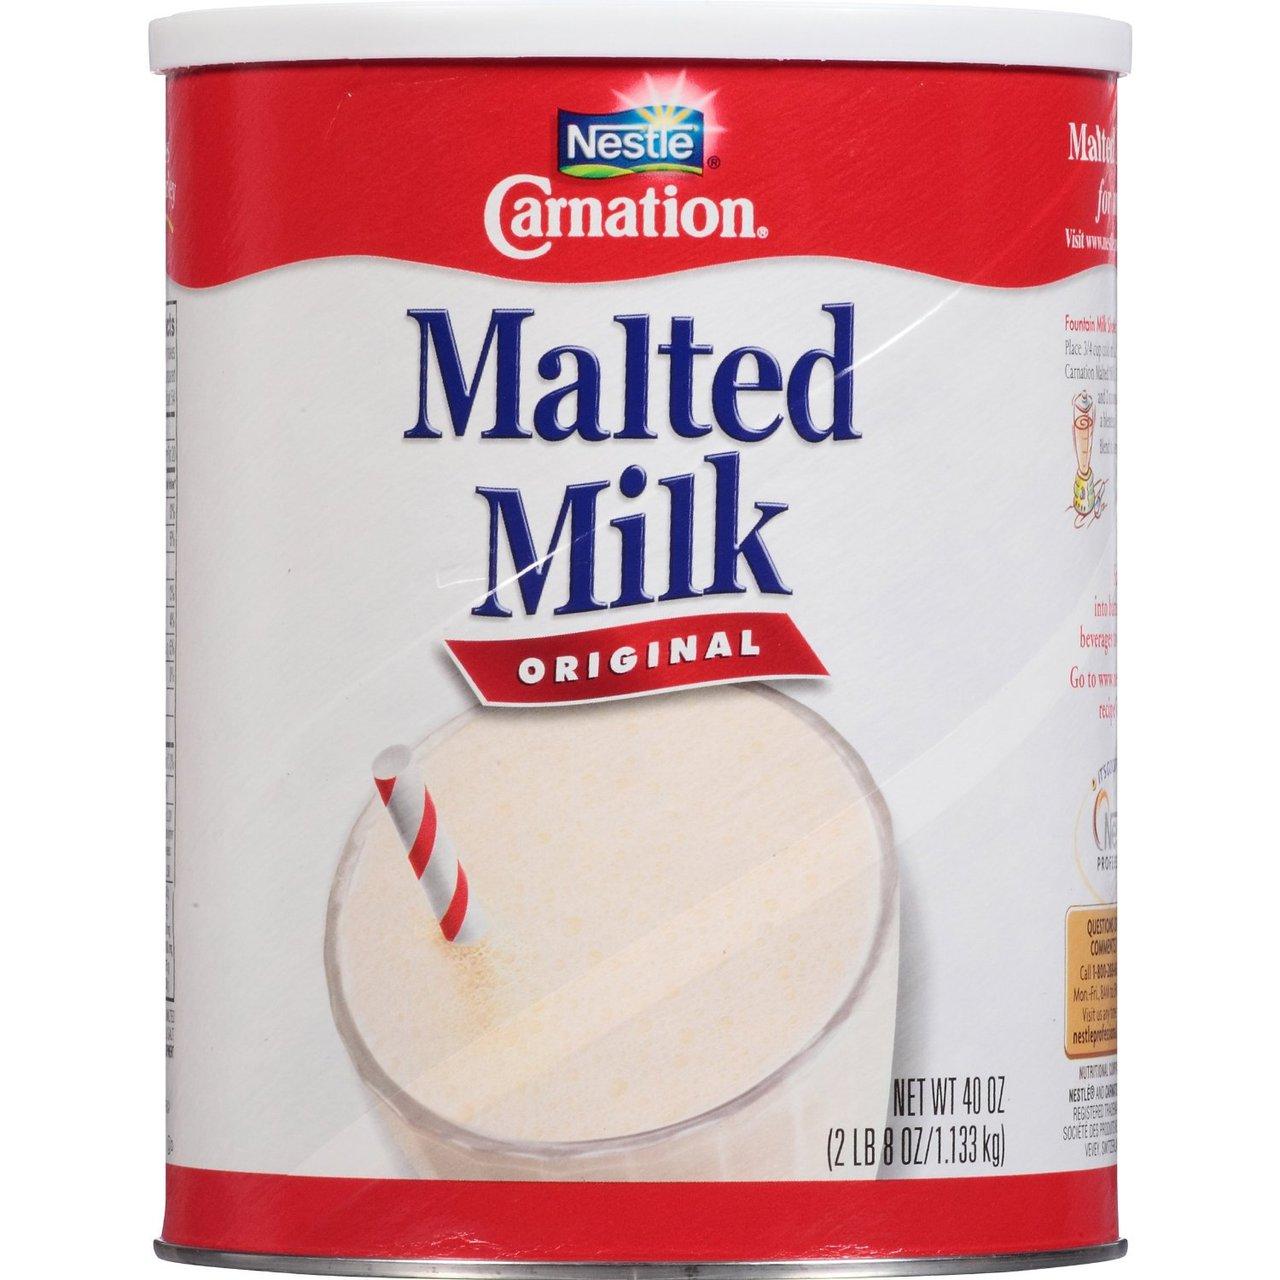 6 PACKS : Carnation Malted Milk, Original 2 Lb 8-Oz